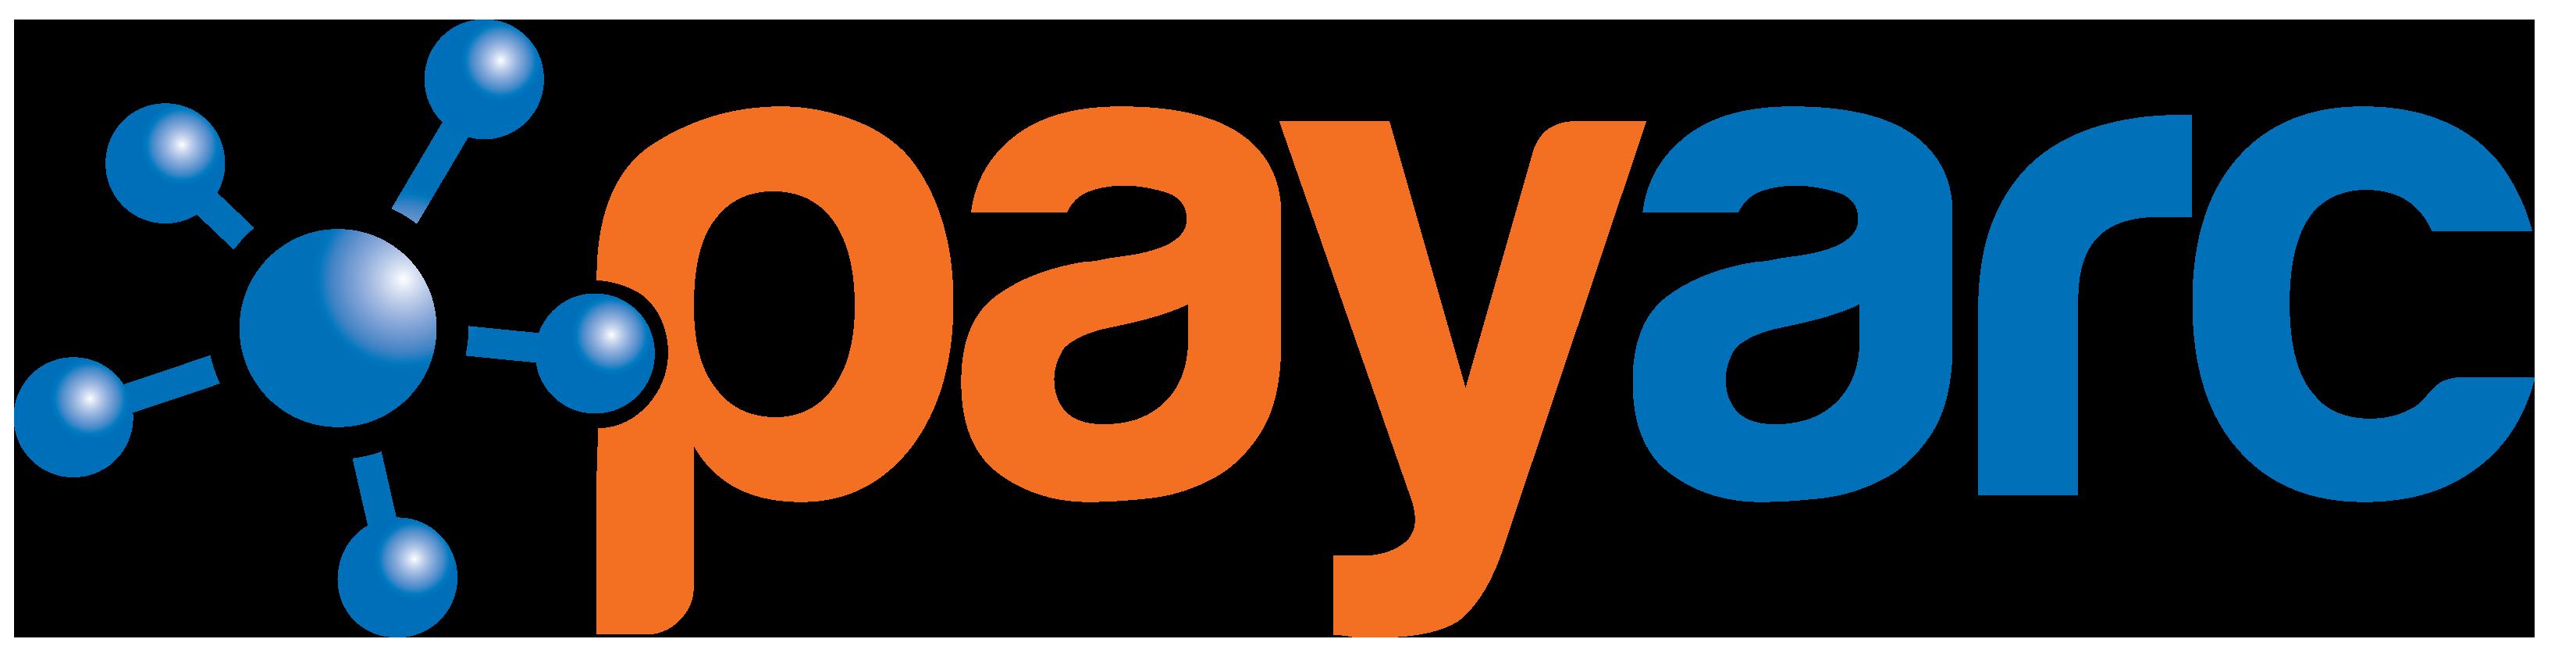 PAYARC (FORMERLY PAYROLL ON THE WEB)